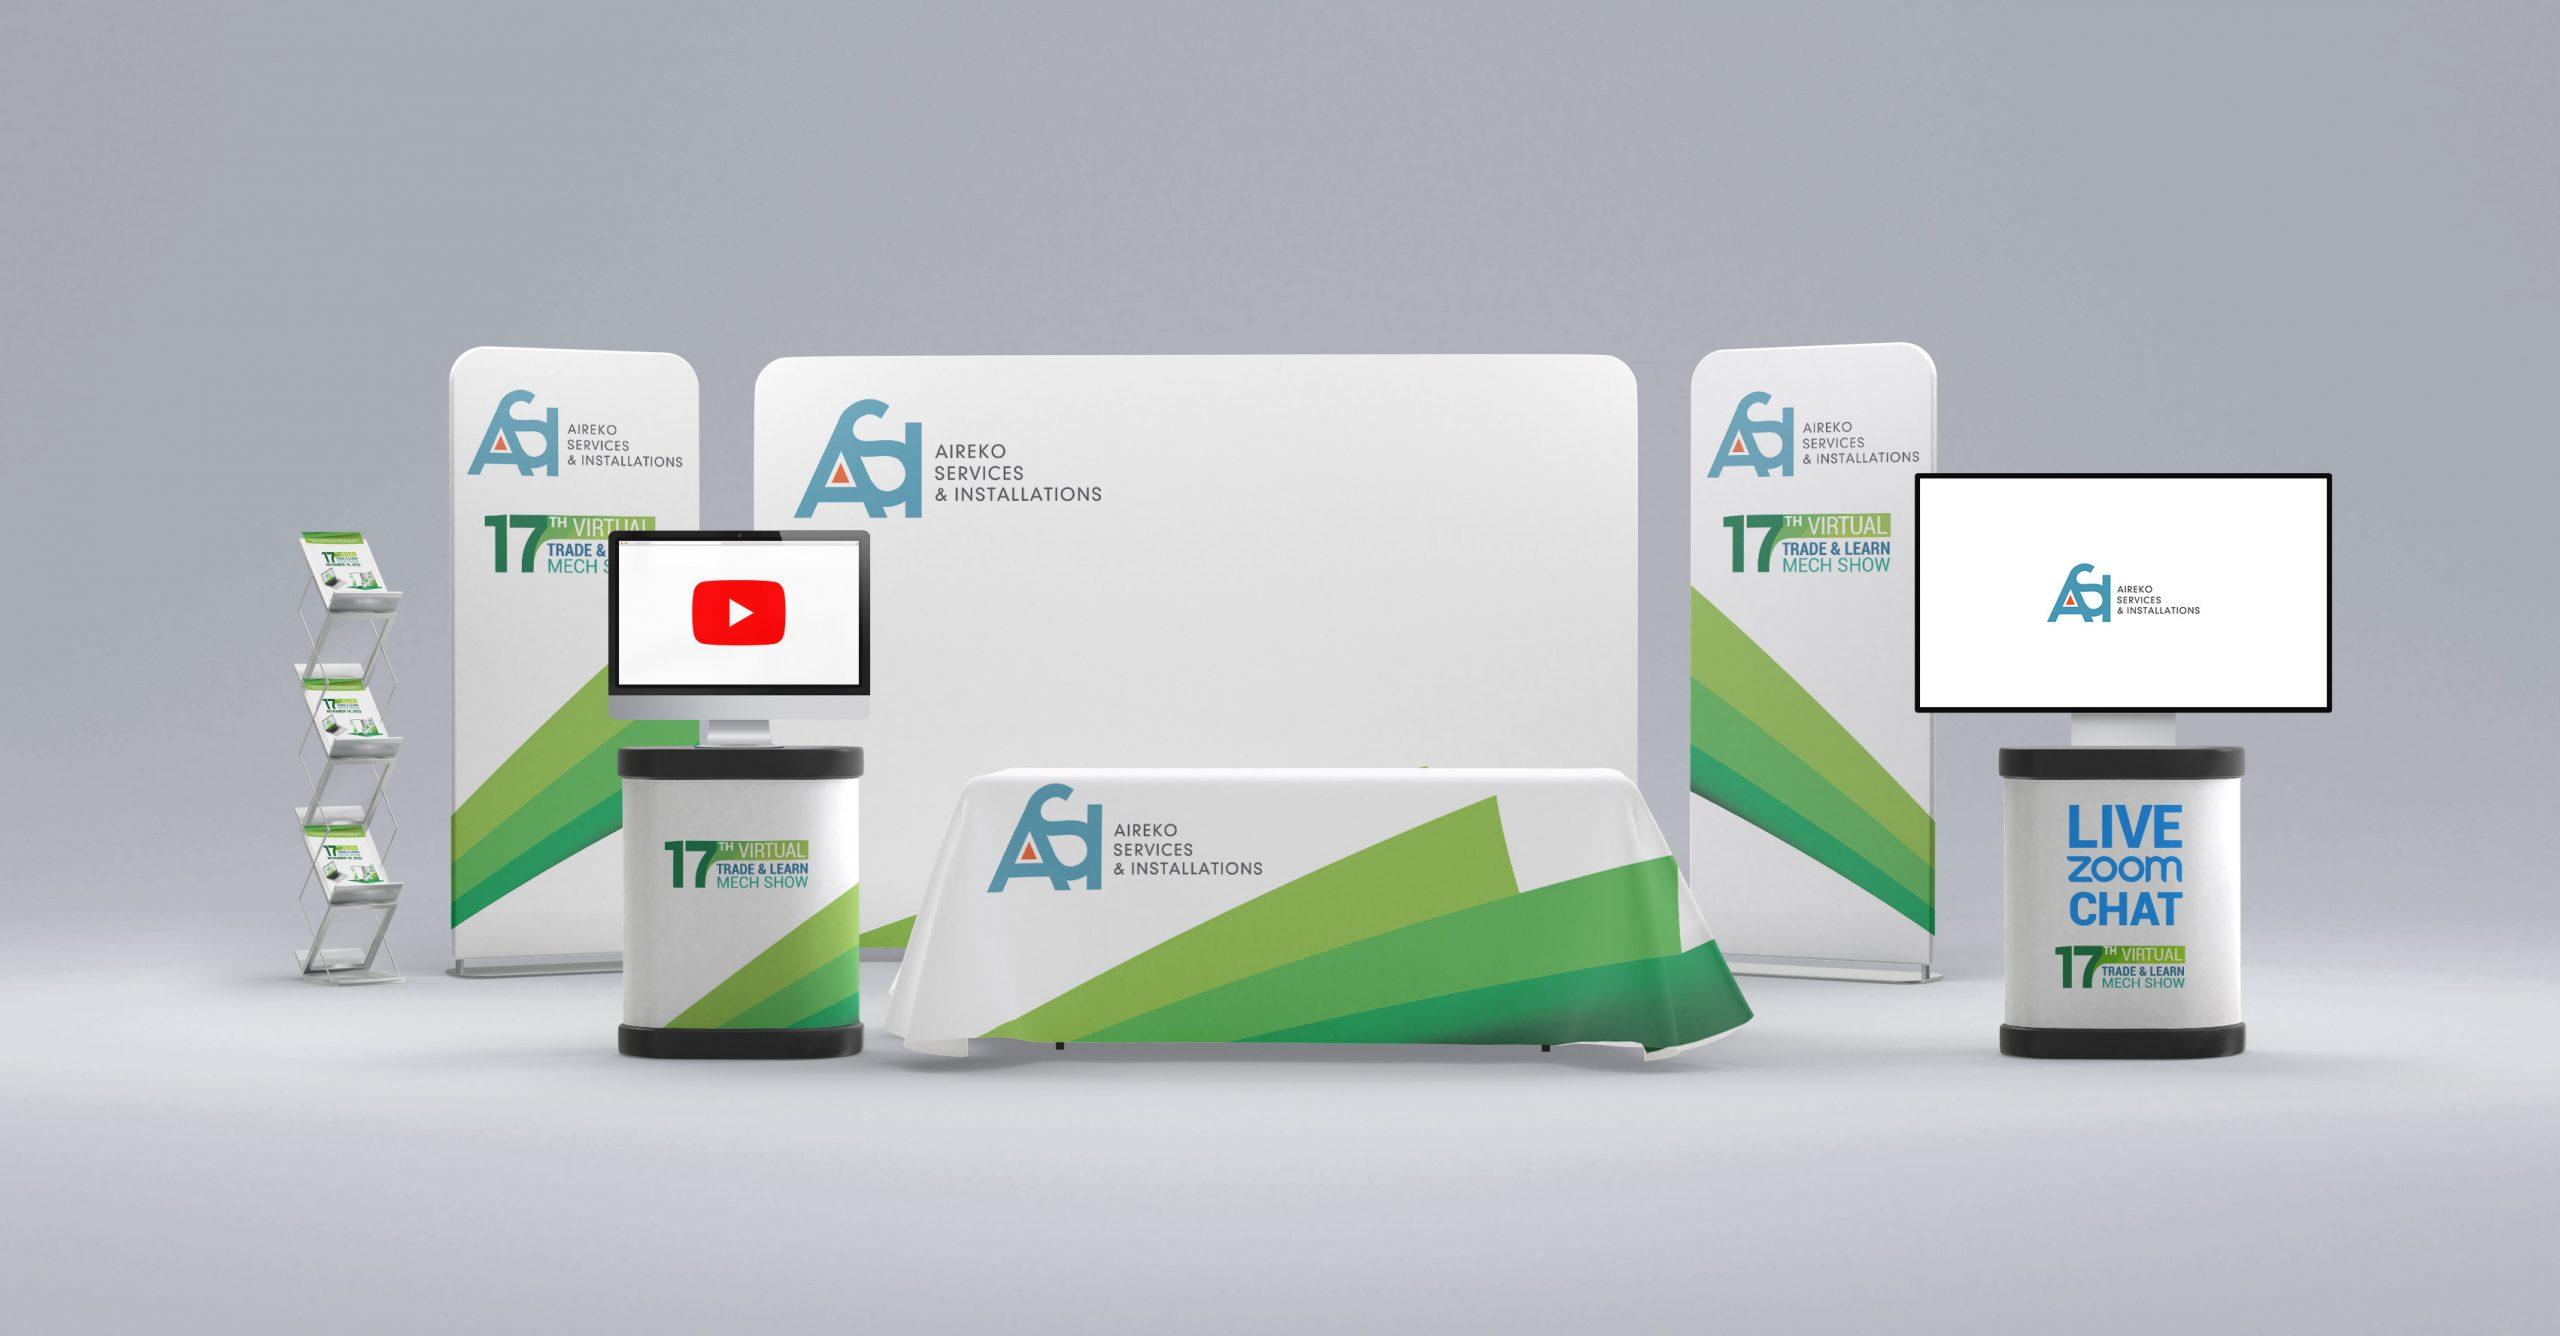 Aireko Services & Installations